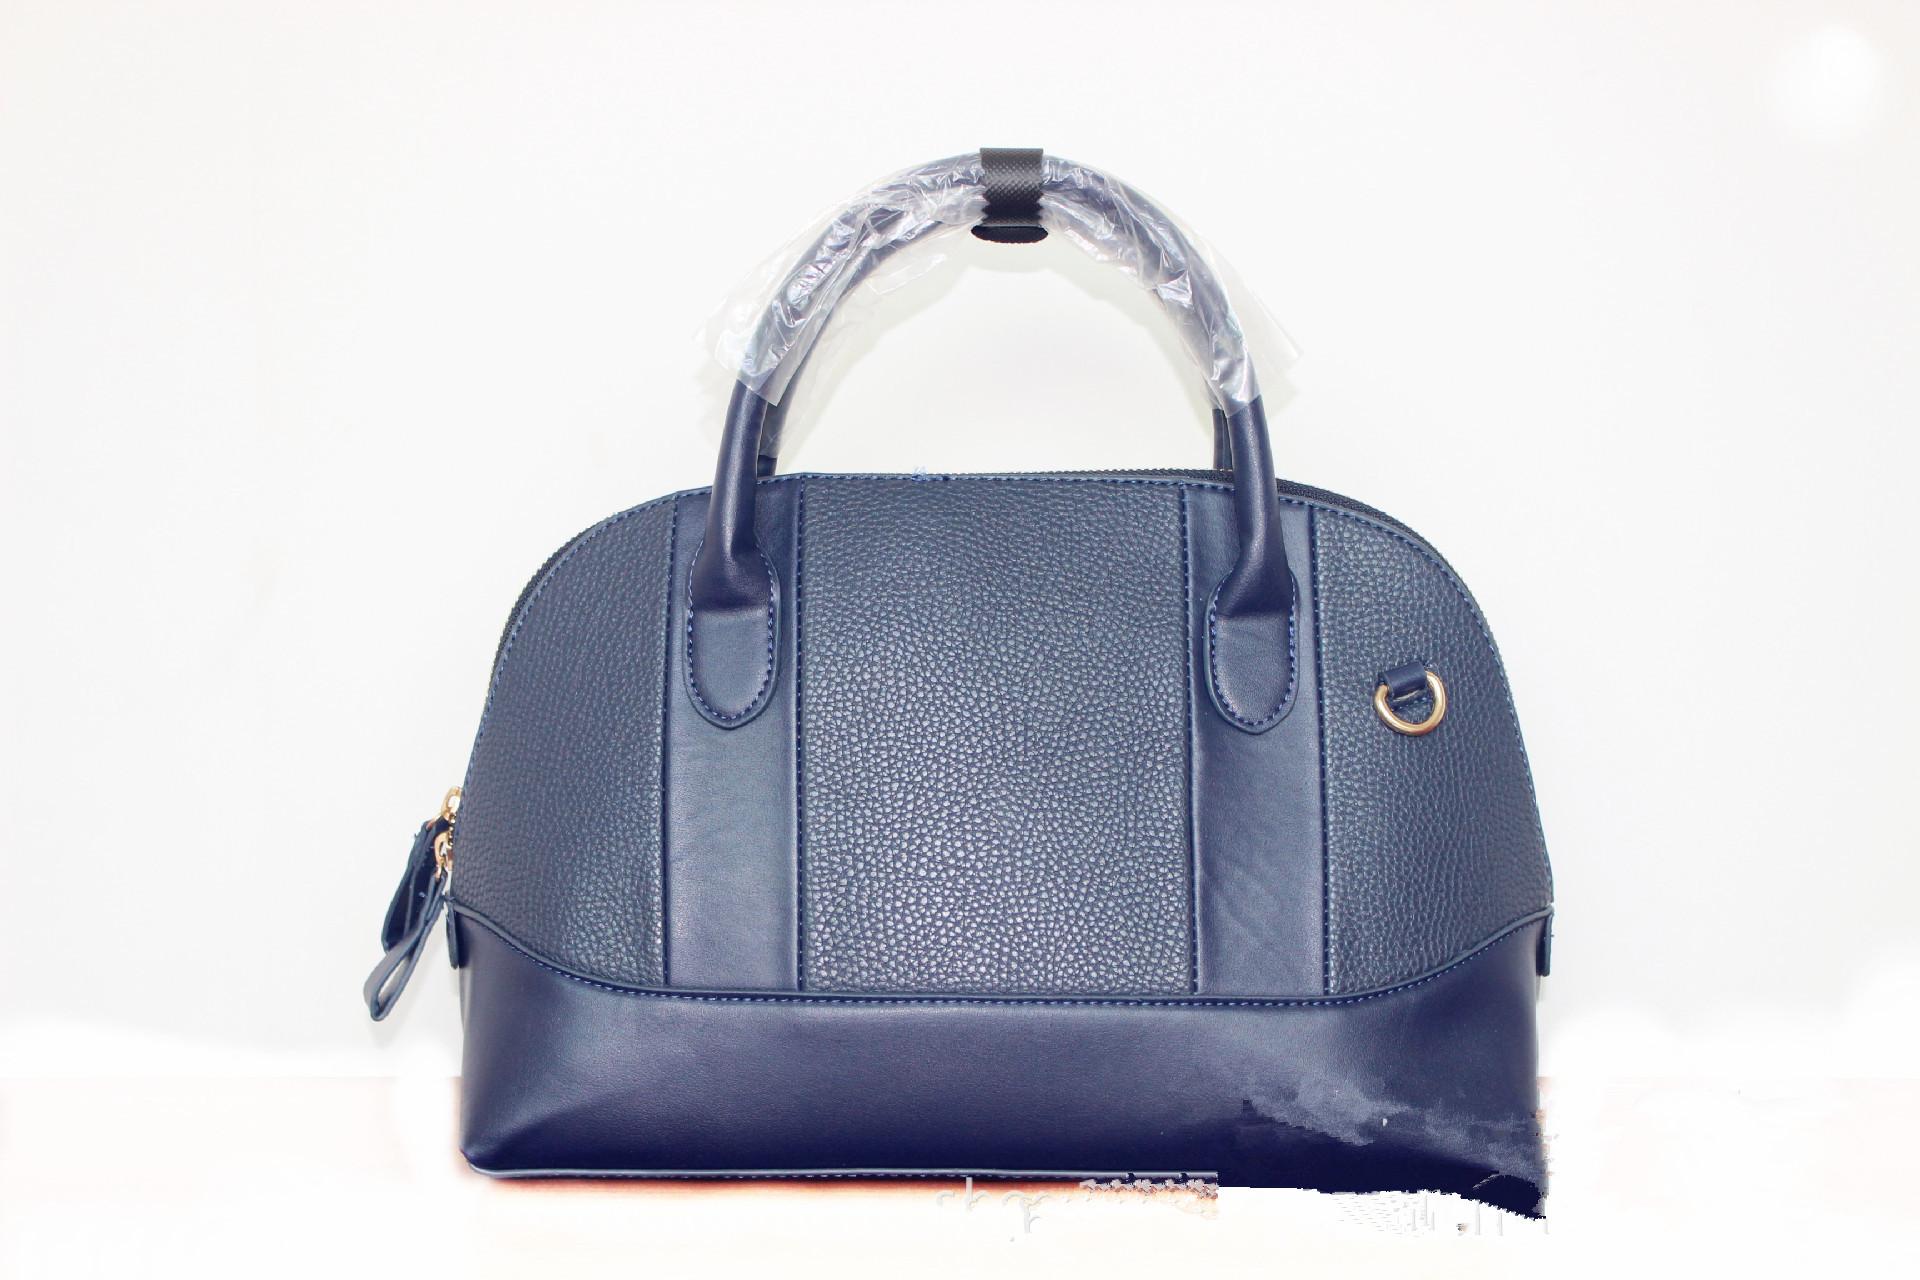 New Fashion Womens Shell Shoulder Handbags European &amp; American Style Hight Quality PU Leather Ladies Handbag Casual Totes Bags <br><br>Aliexpress